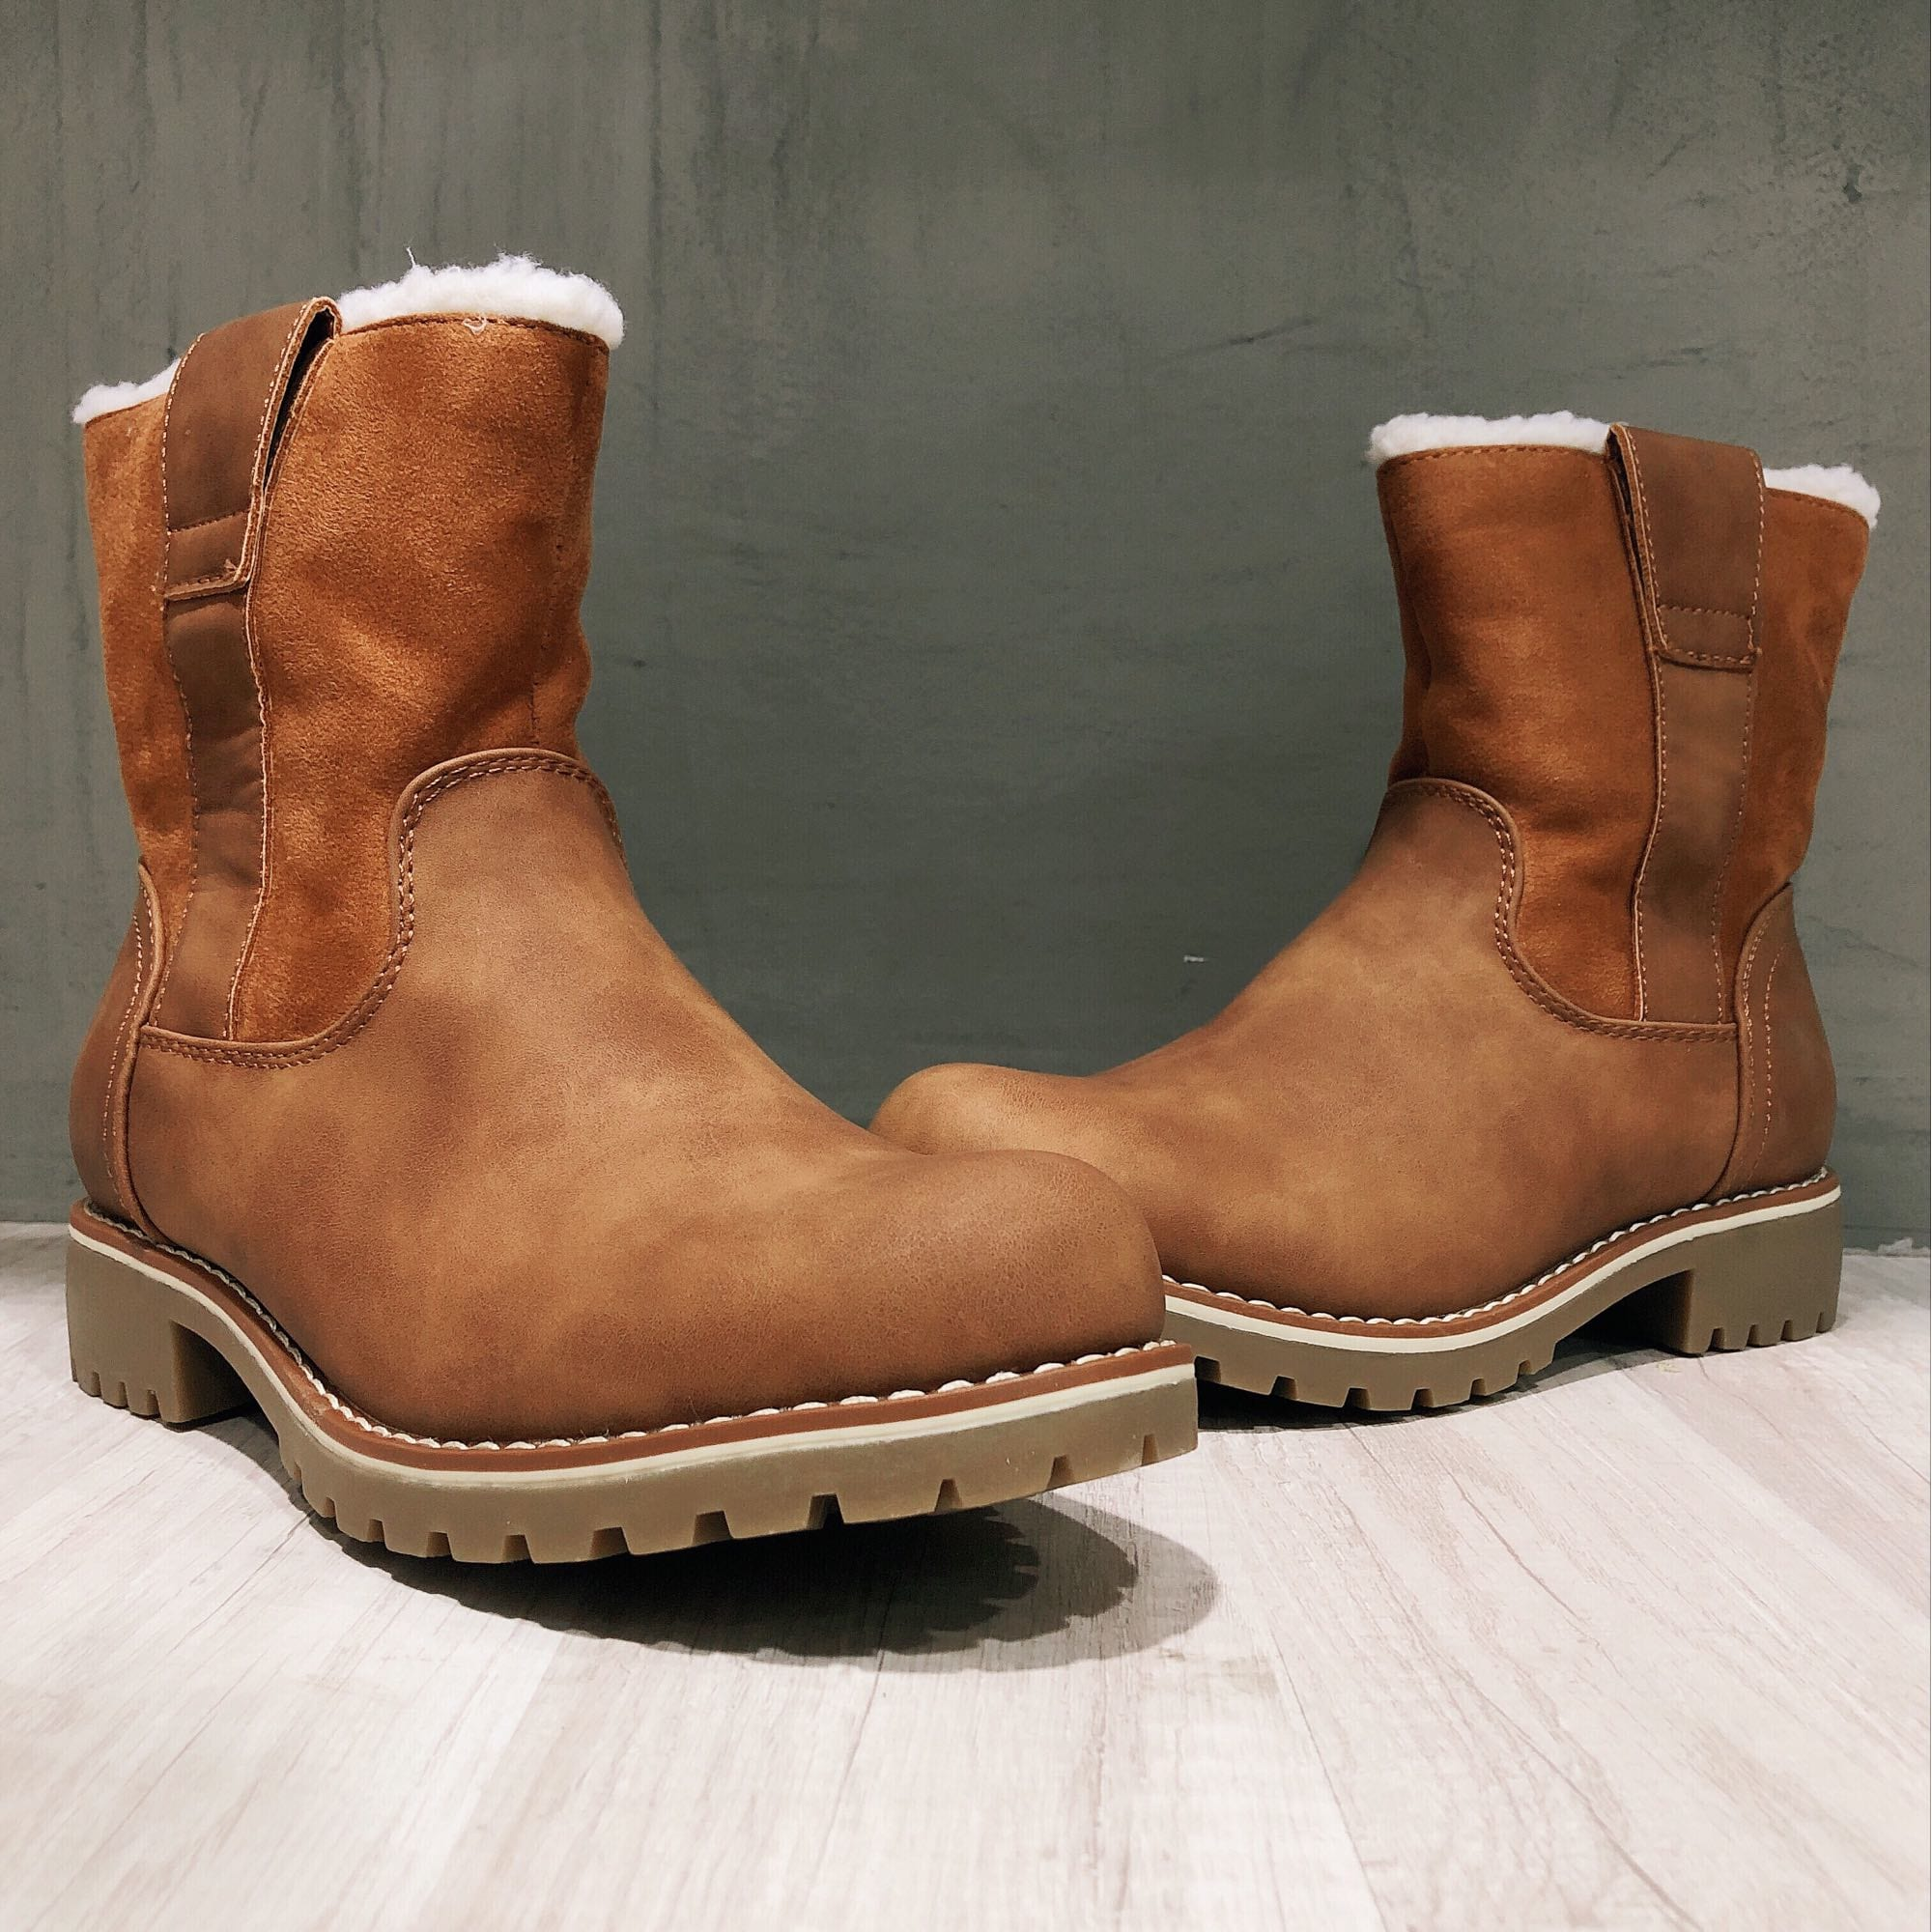 917fdf722db4 Boots Low amp  Sixth Sens 8335329 38 Beige Bottines Plates E1P4q